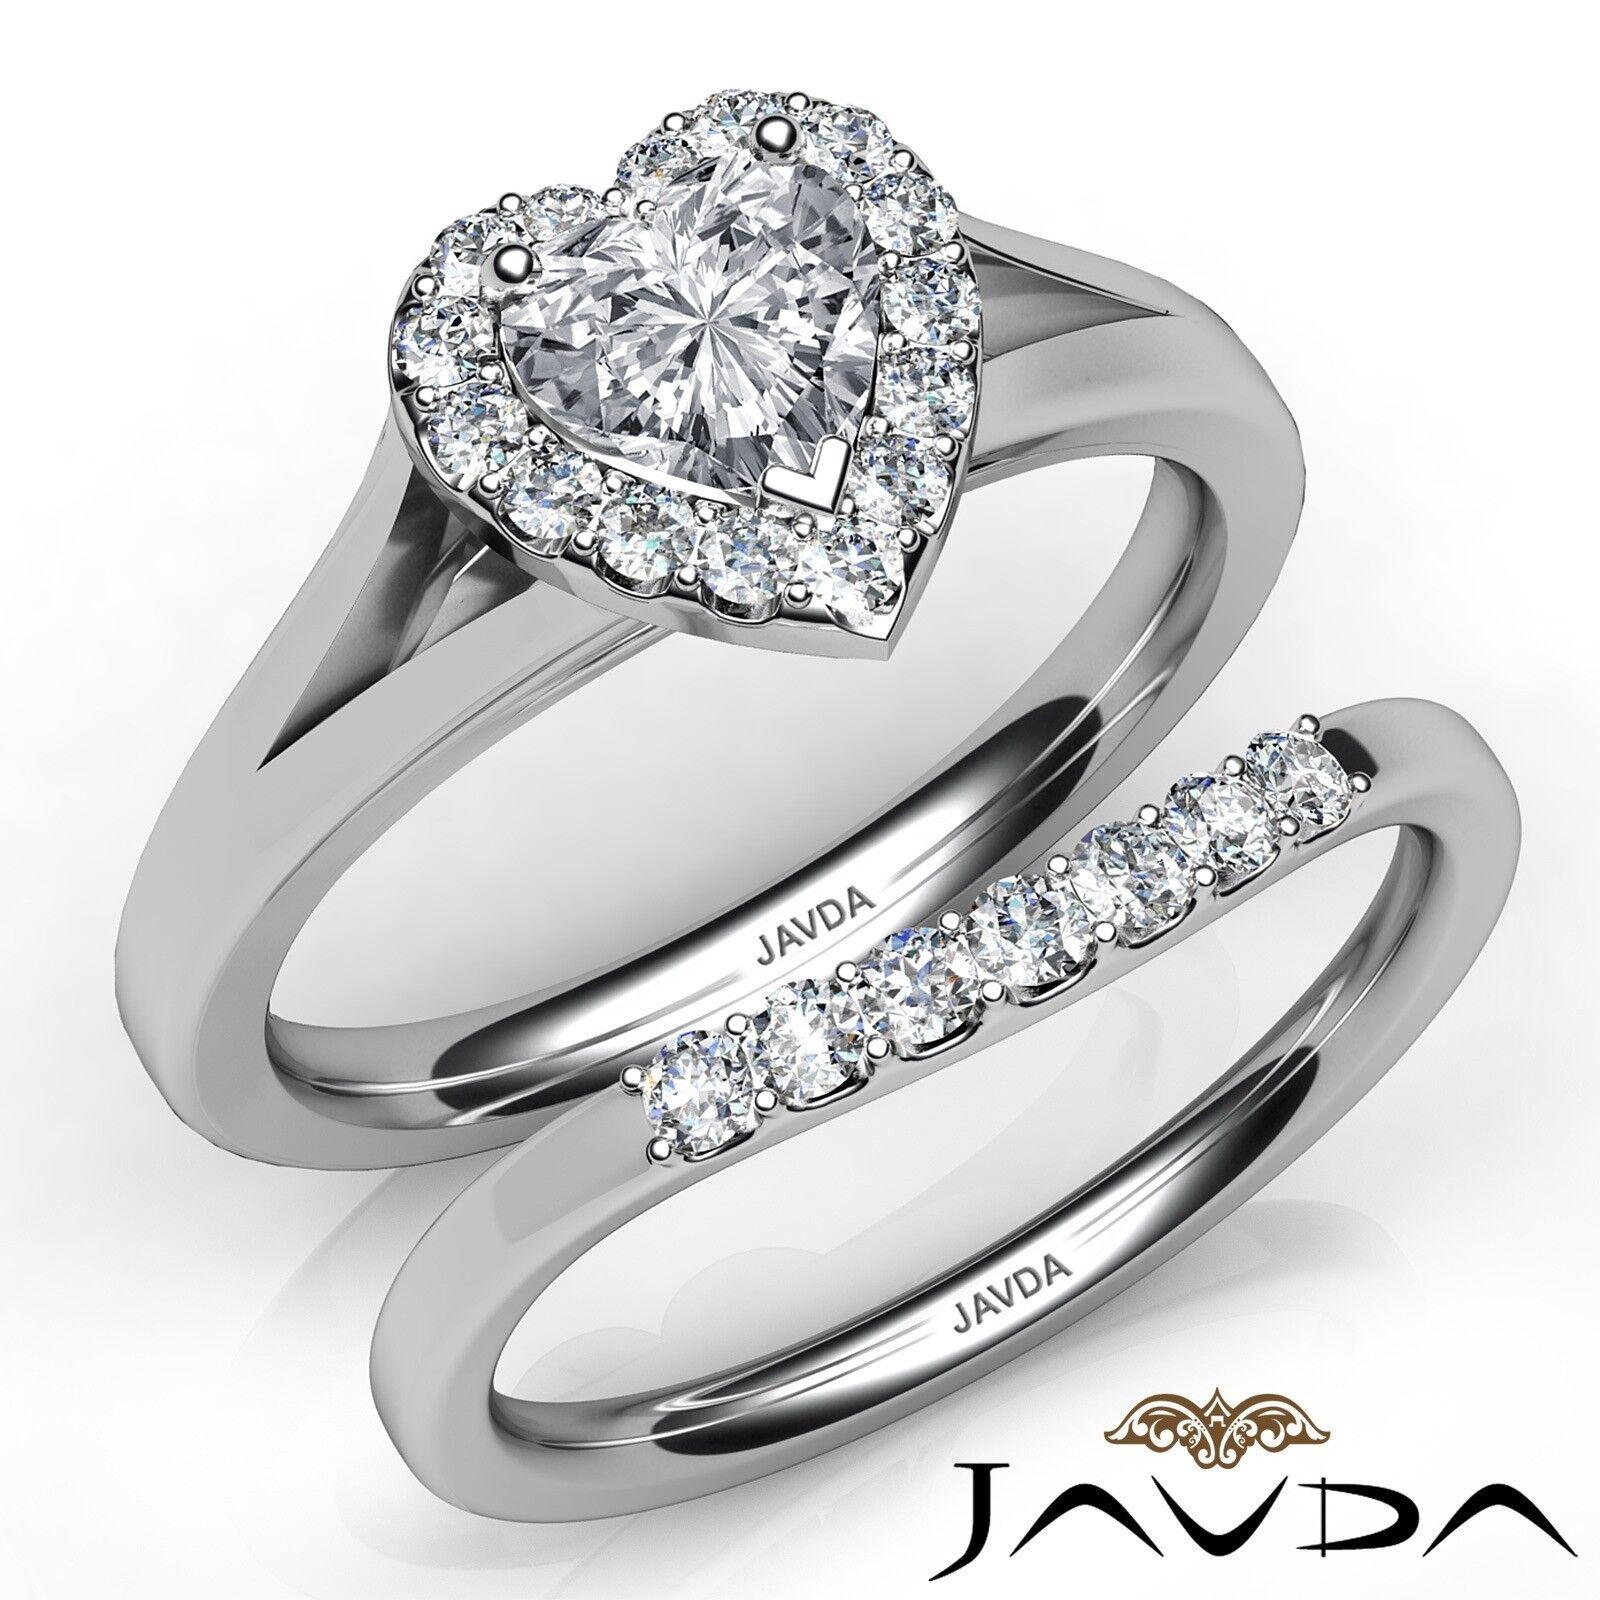 1.22ctw Pave Halo Bridal Set Heart Diamond Engagement Ring GIA G-VVS2 White Gold